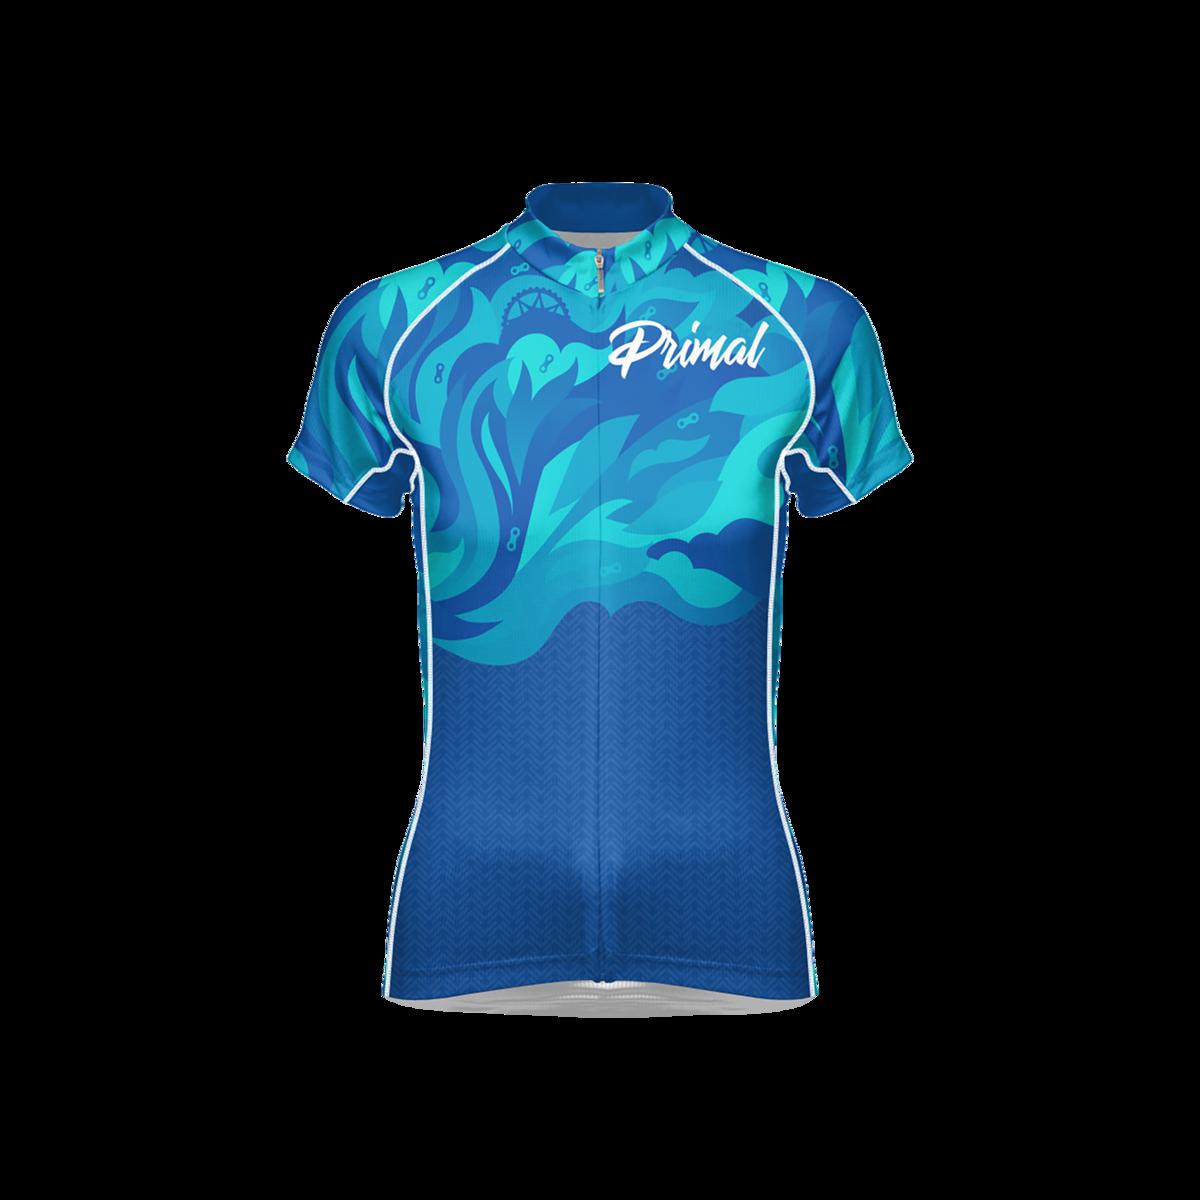 Fierce Women's Blue Flame Evo Cycling Jersey